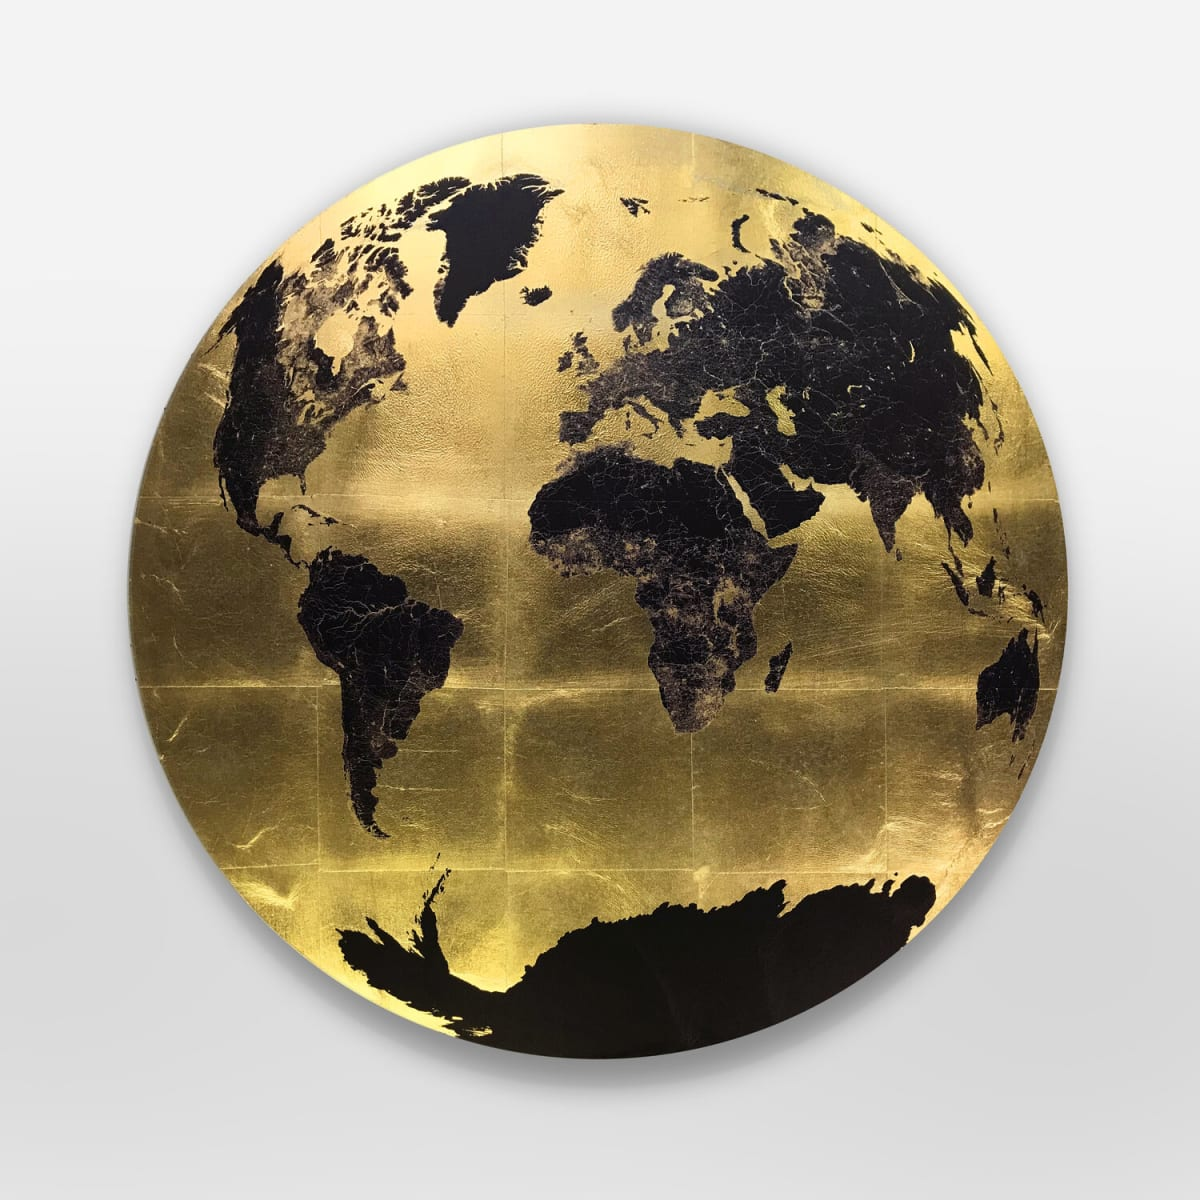 Ewan David Eason, Celestial Sphere (Centred on Europe and Africa), 2019